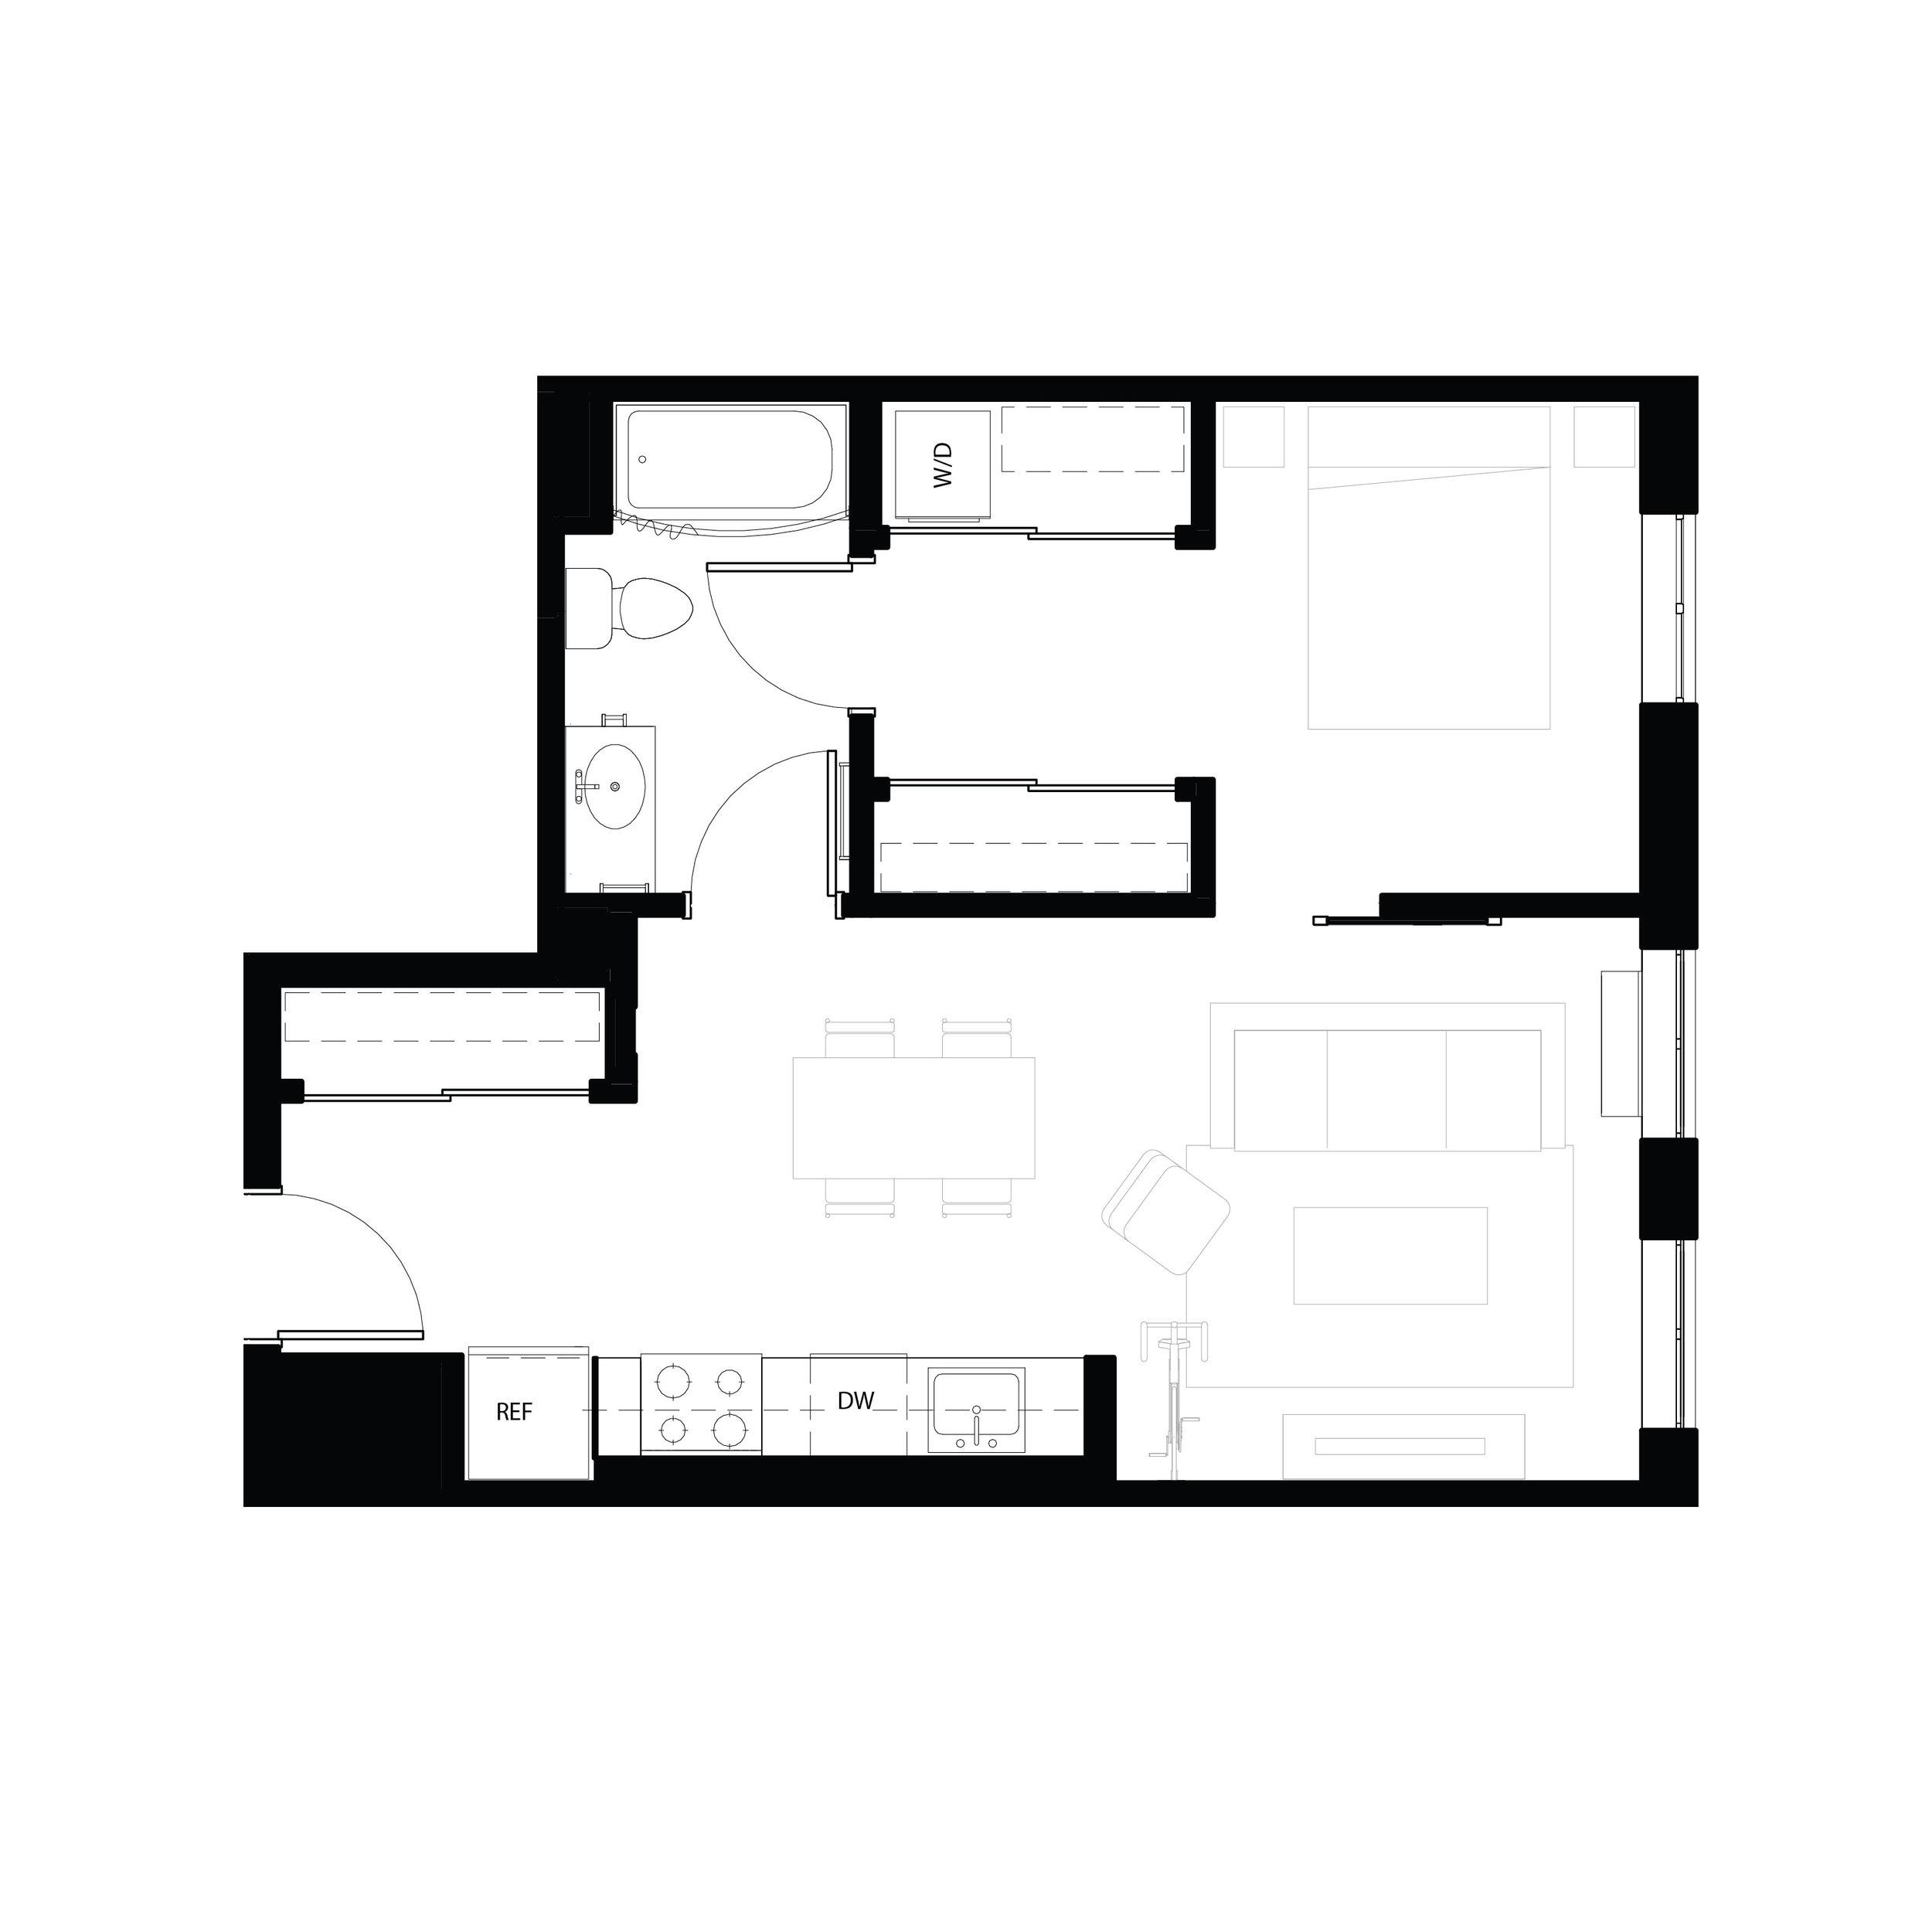 One bedroom 603 sq ft